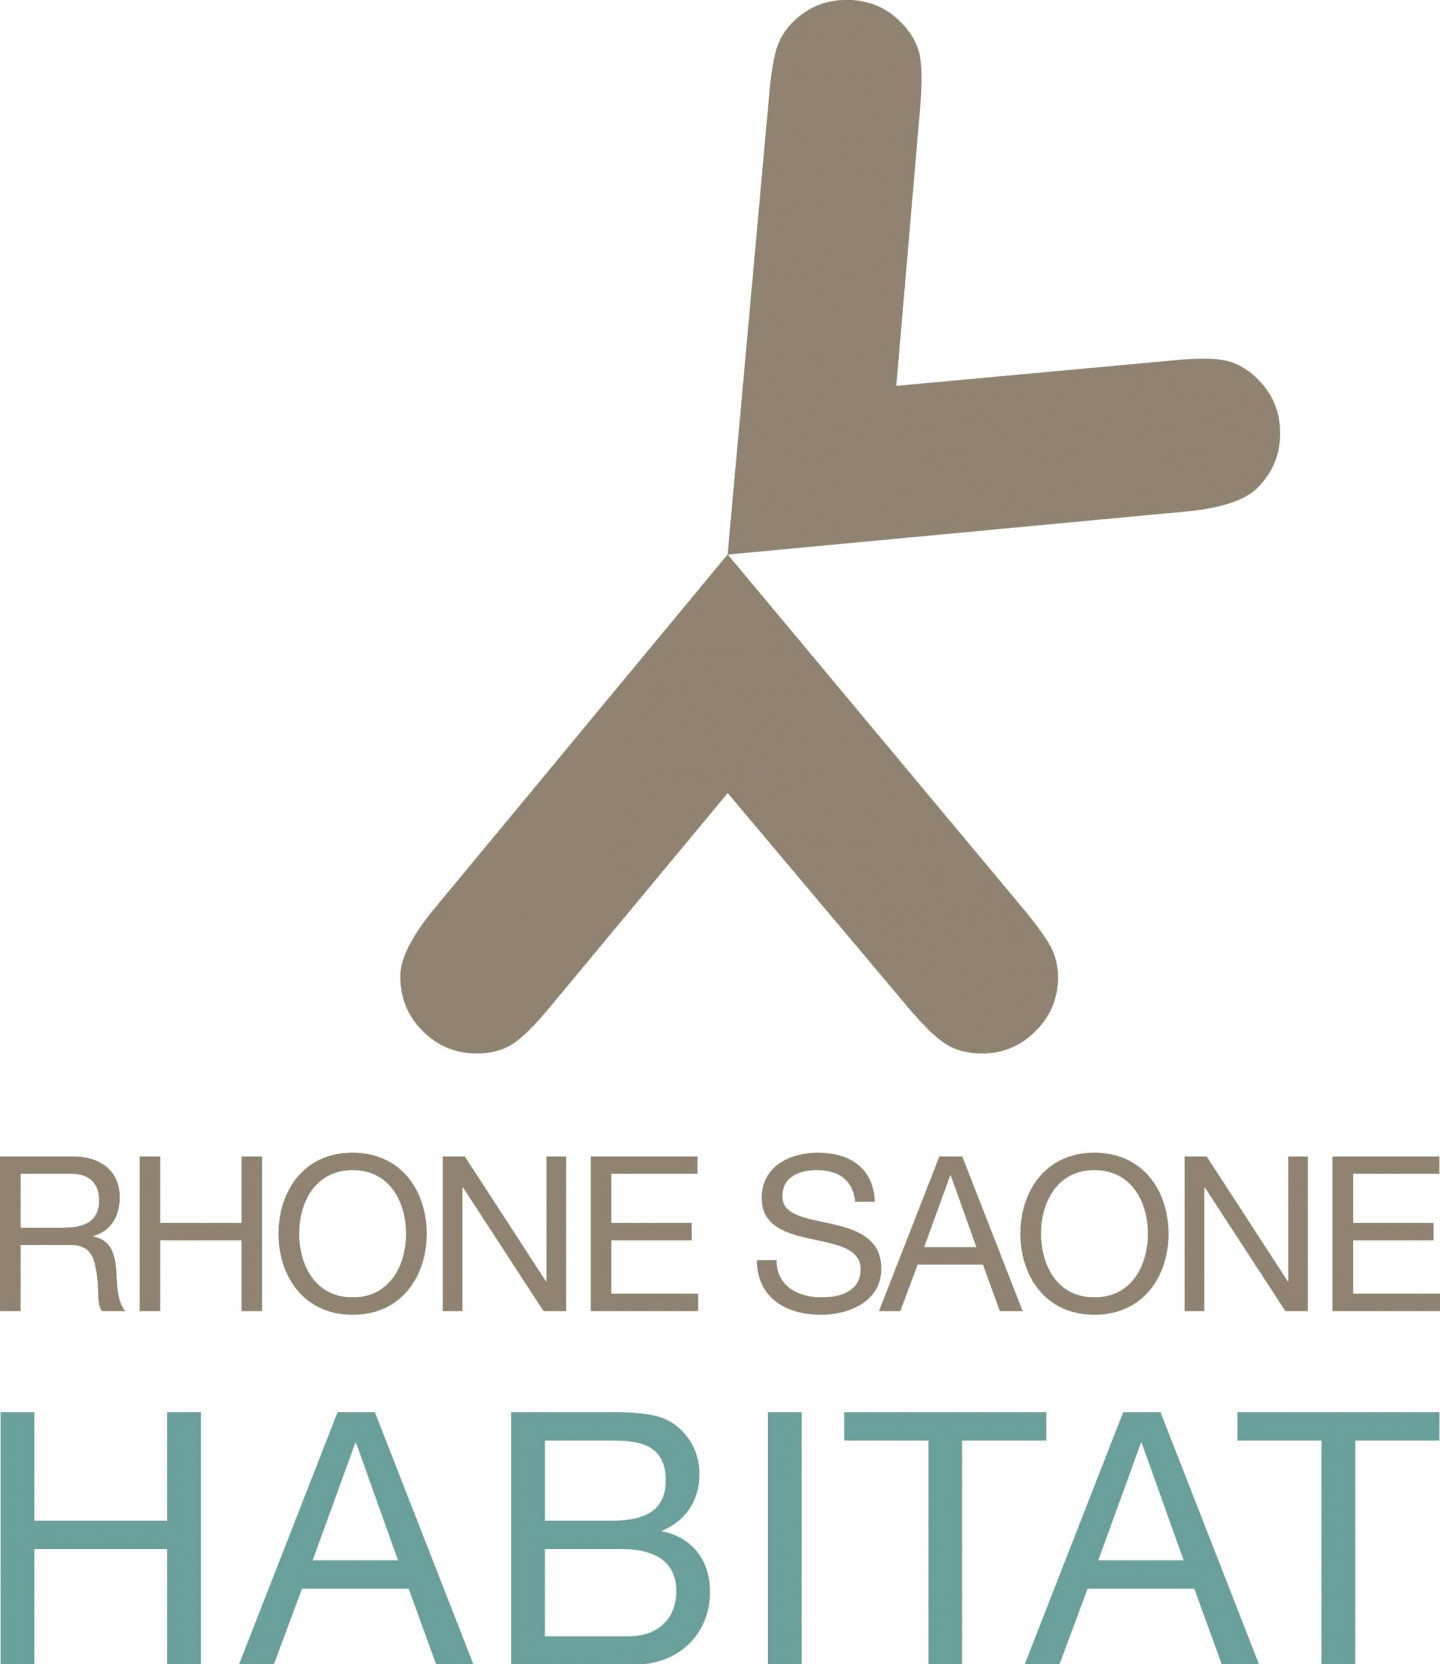 logo rsh 300ppp format A4